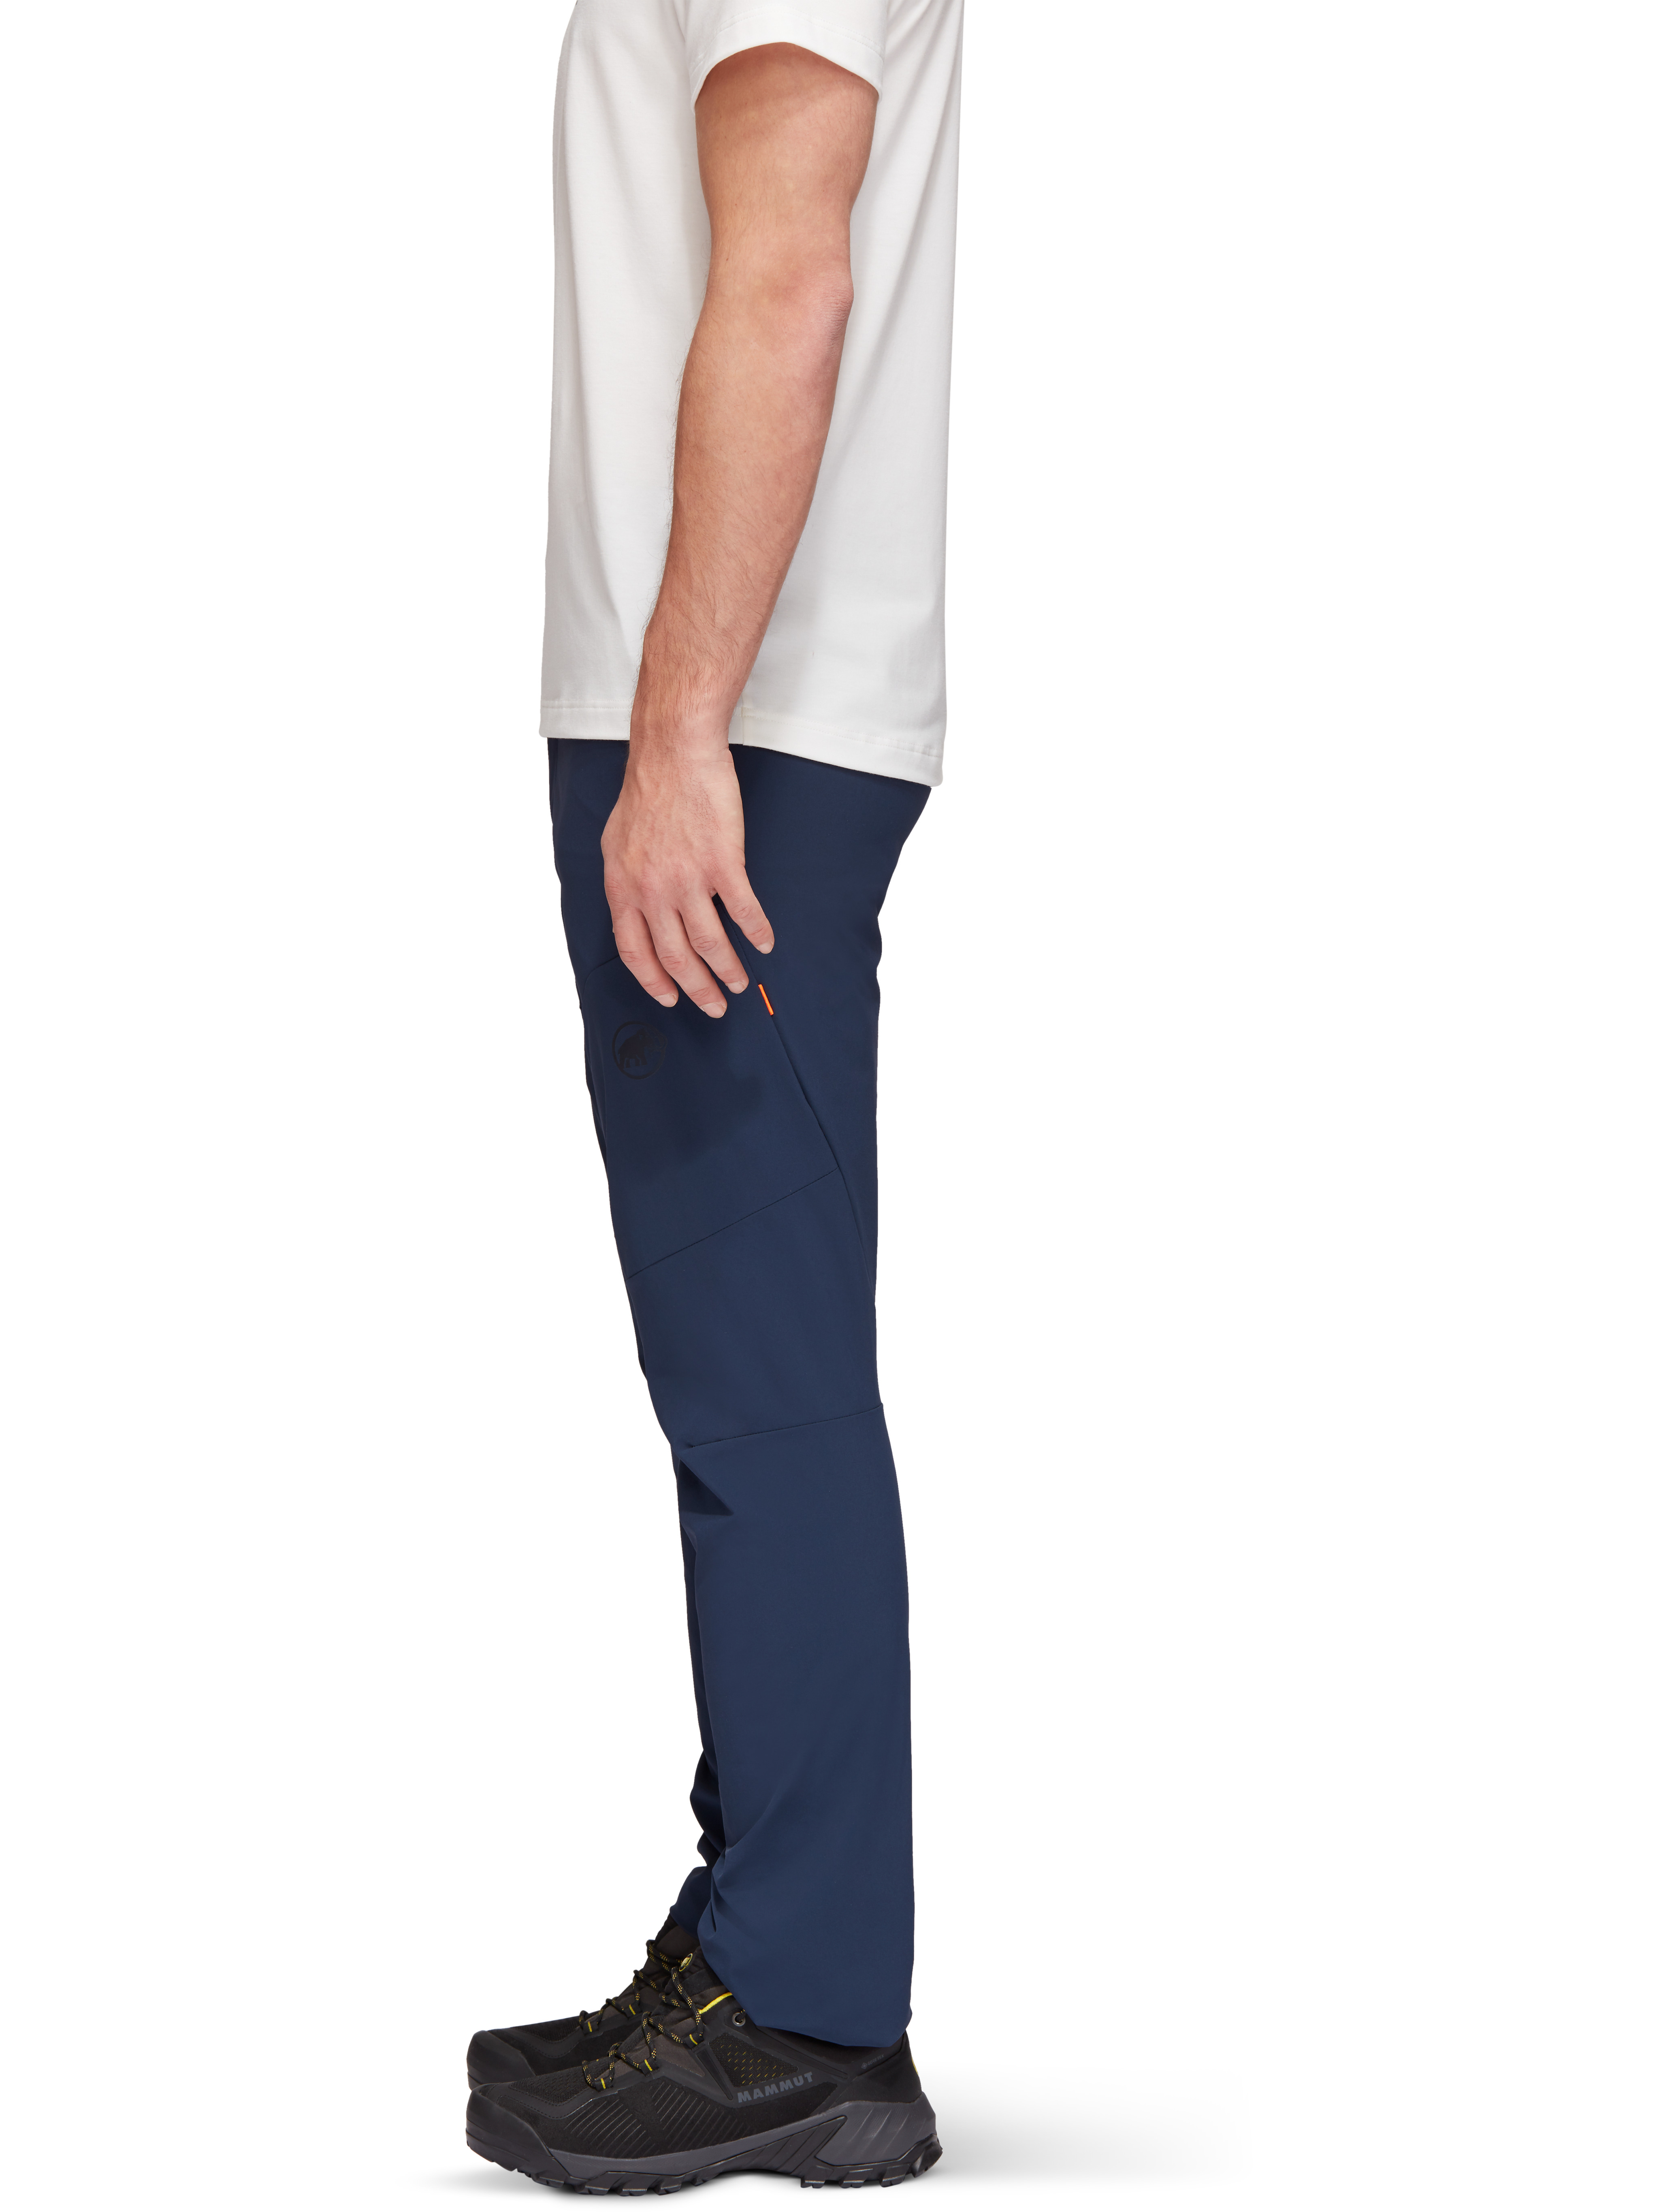 Runbold Pants Men product image